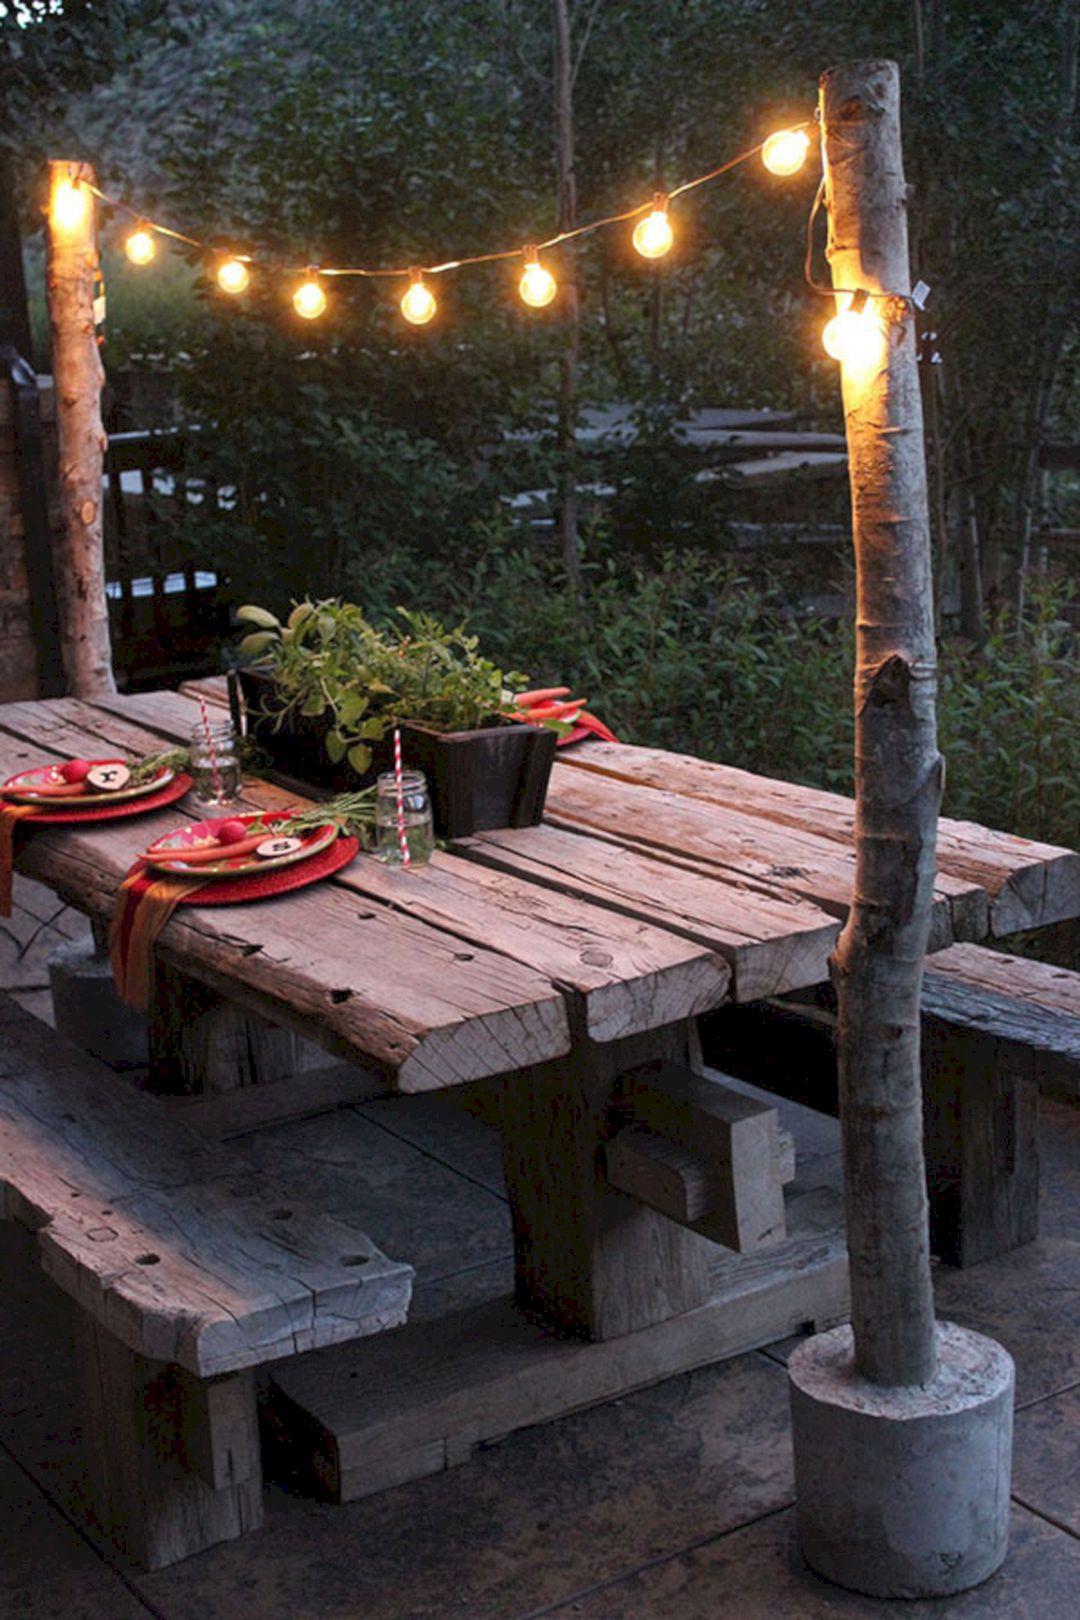 Outdoor Patio Lights String Poles (Outdoor Patio Lights ... on Backyard String Light Designs id=12223